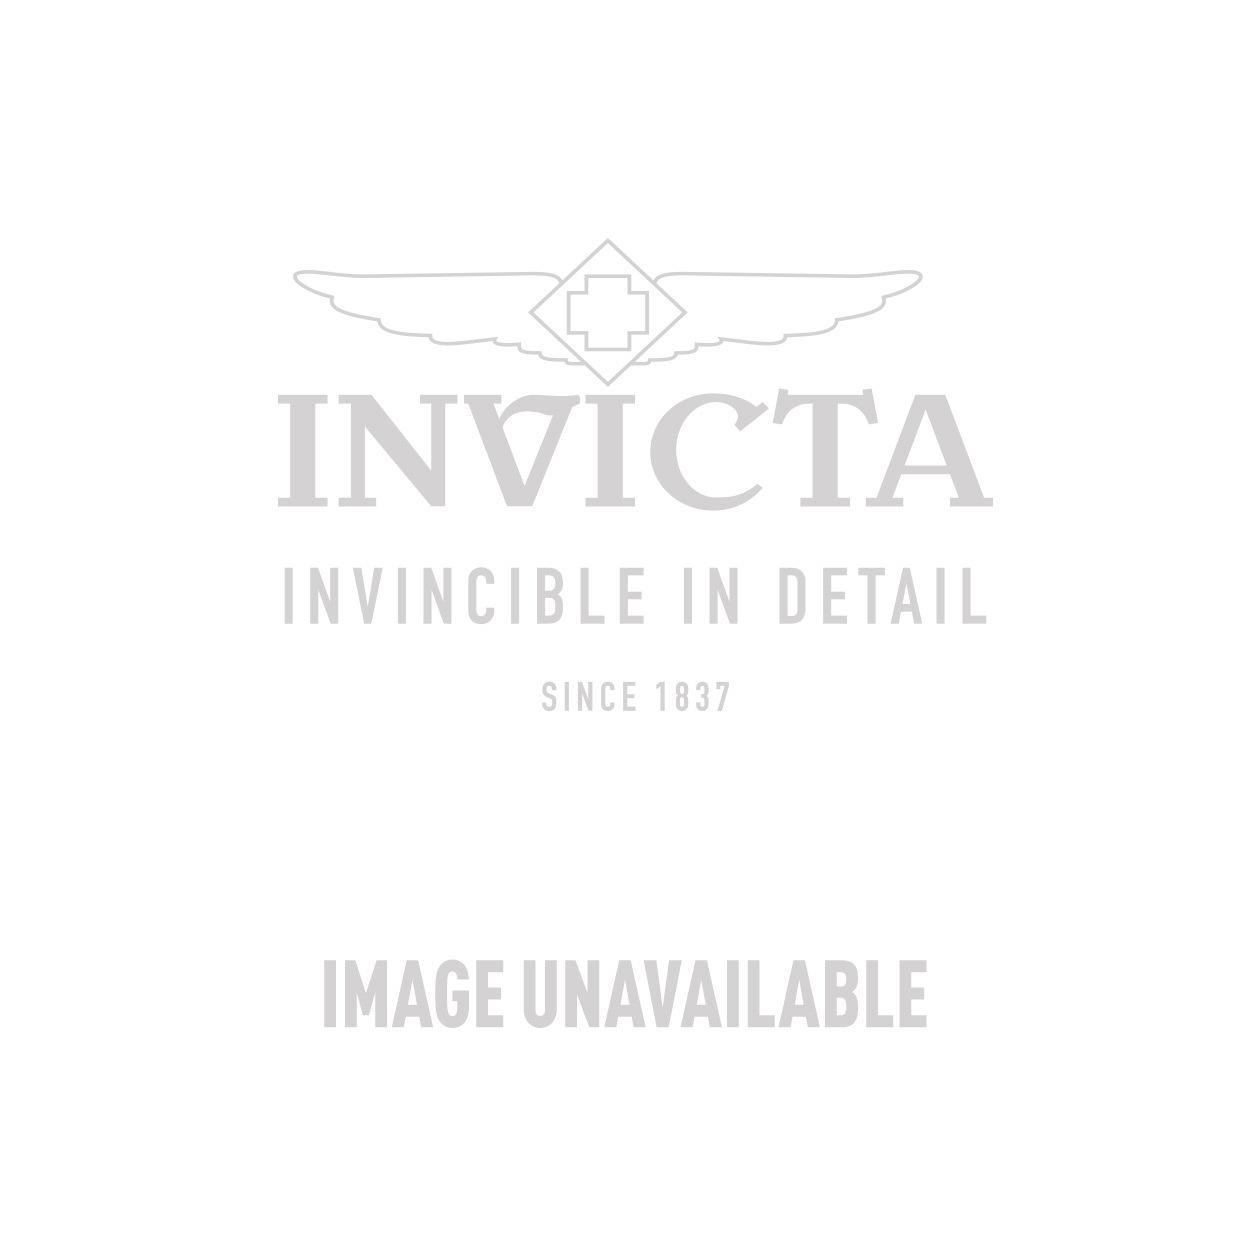 Invicta Artist Quartz Watch - Black, Stainless Steel case with Steel, Black  tone Stainless